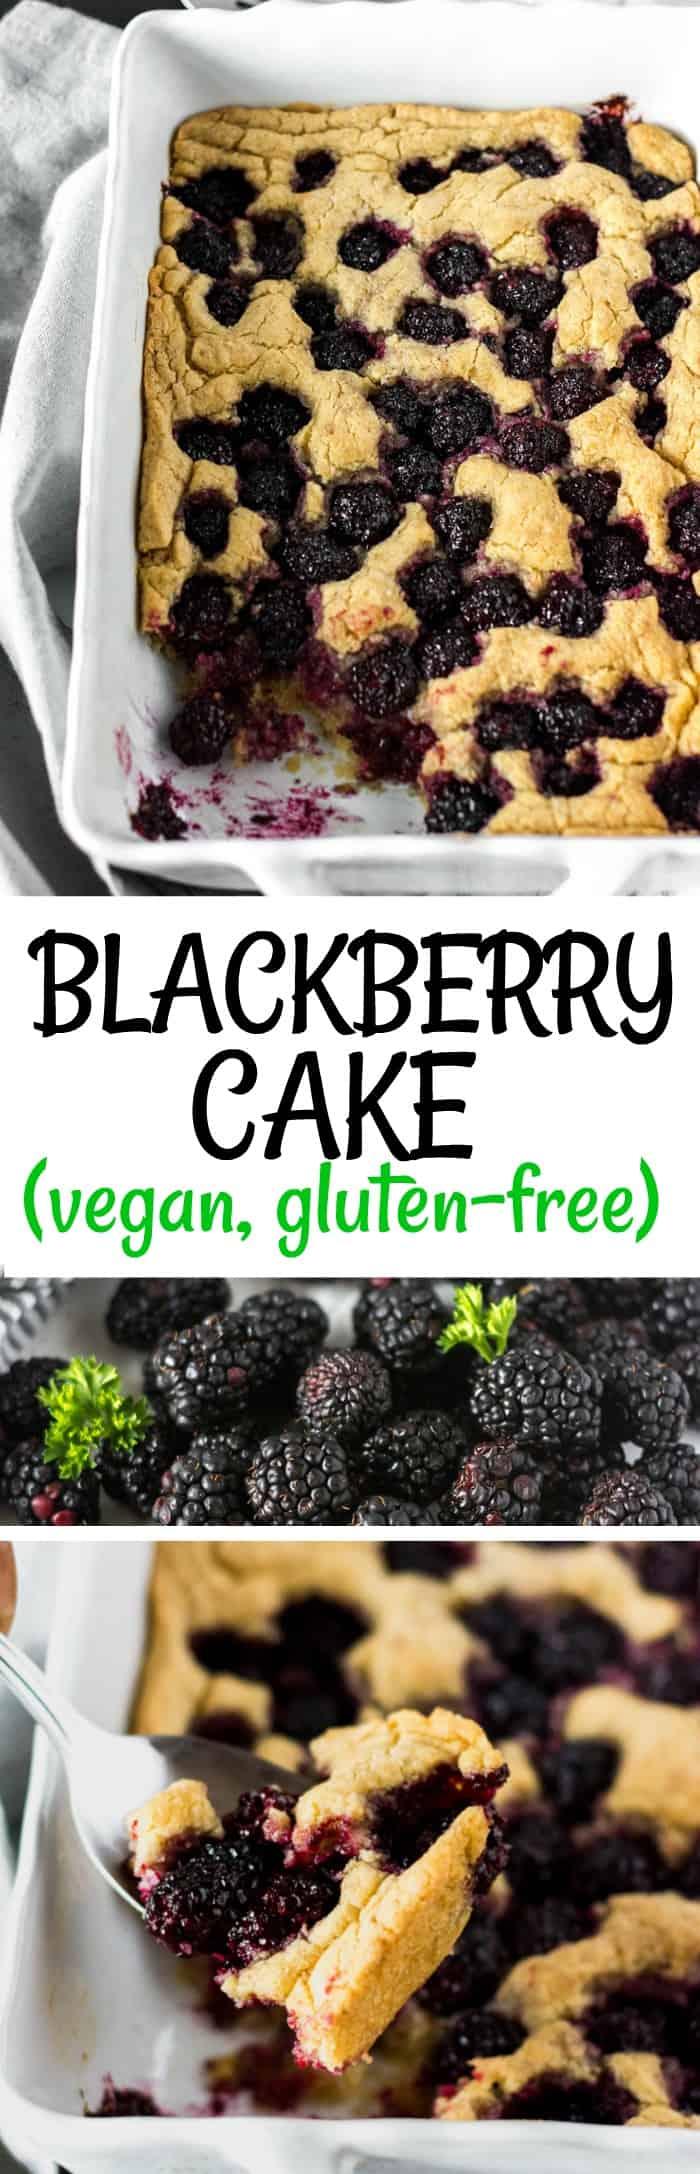 Vegan Gluten-Free Blackberry Cake